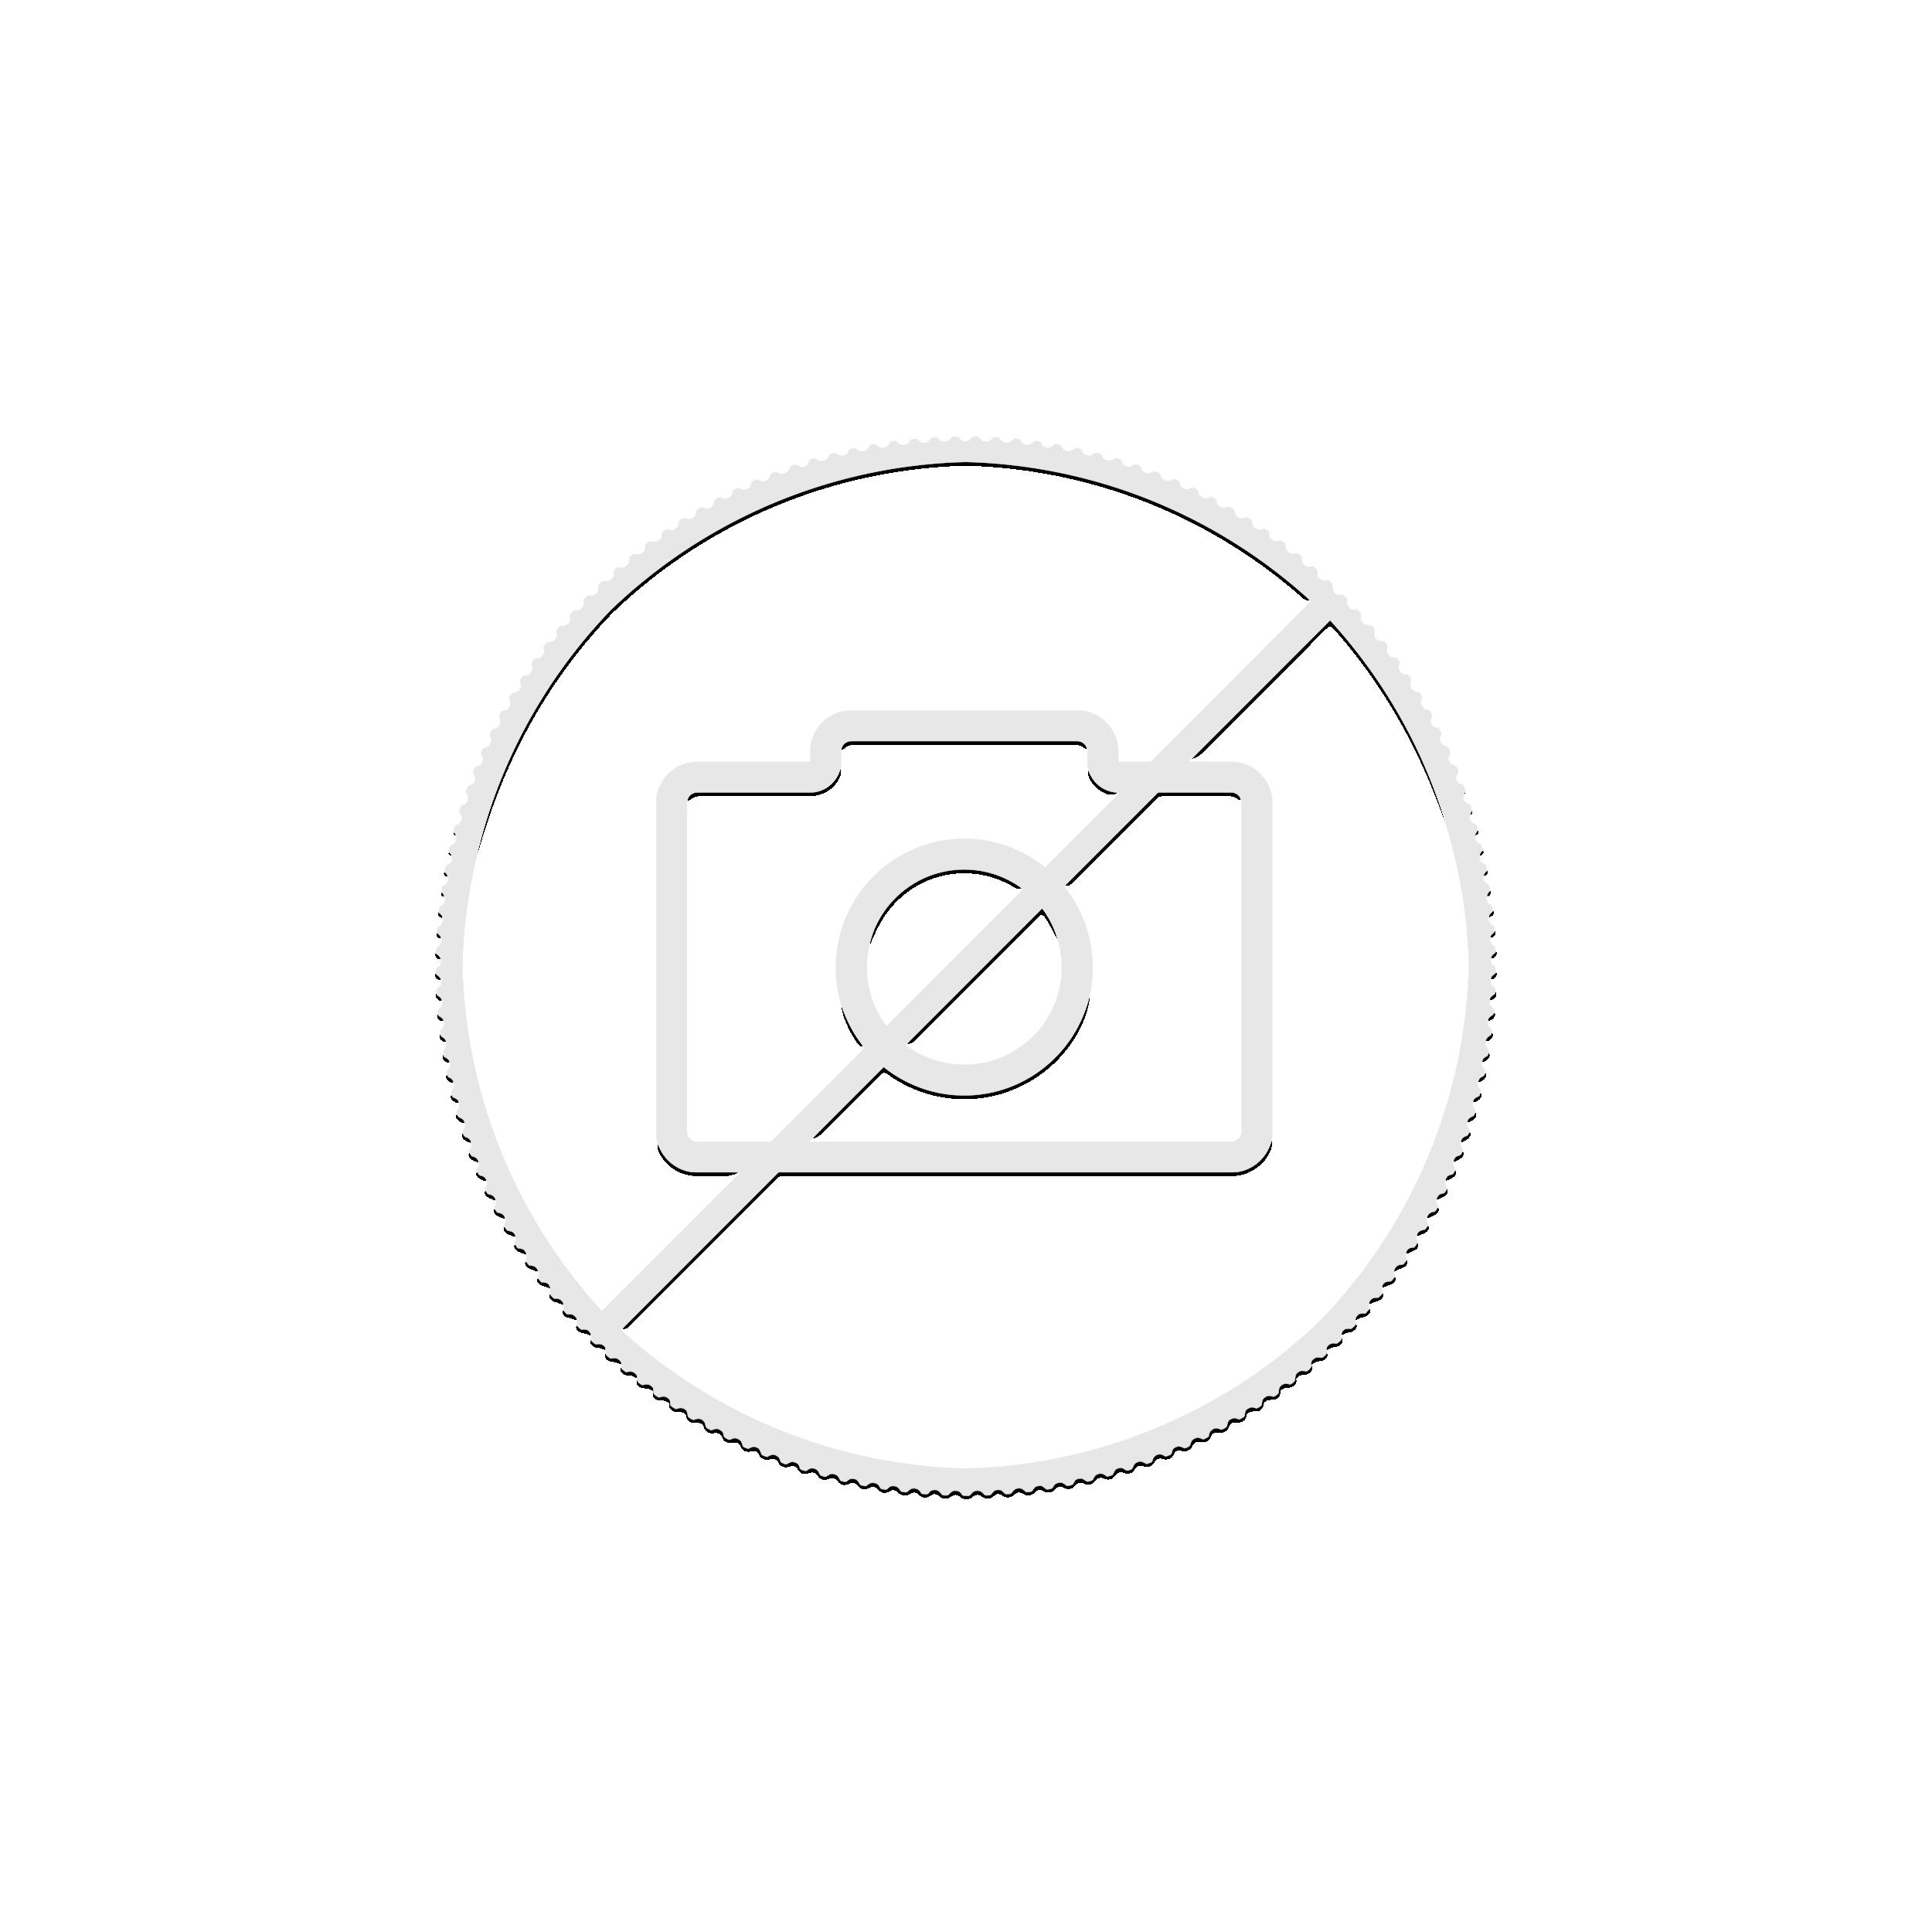 Umicore 20 grams goldbar with certificate